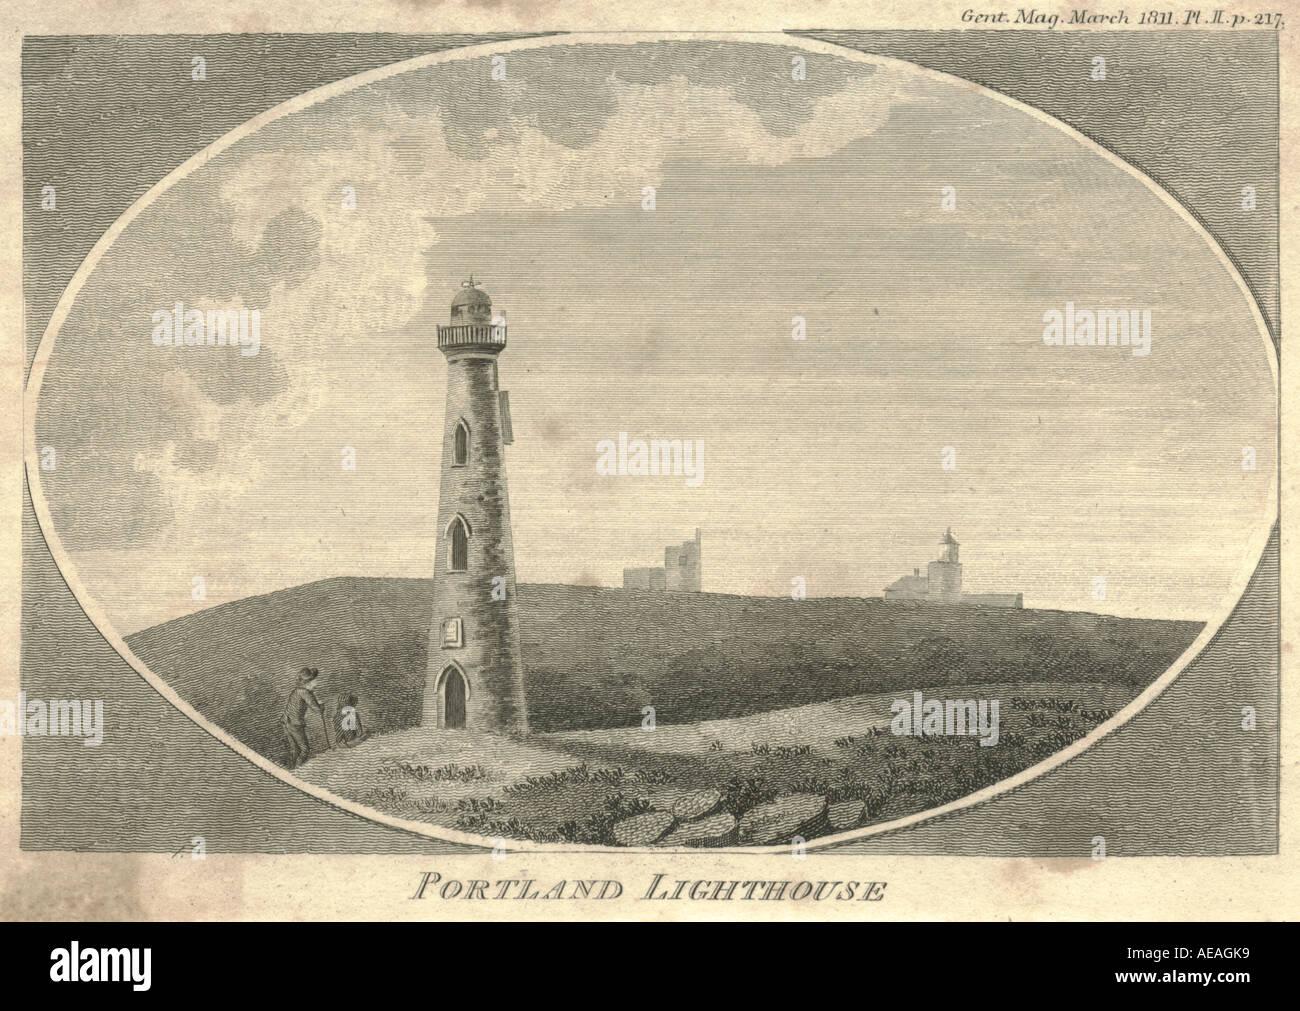 Portland Lighthouse circa 1811 - Stock Image